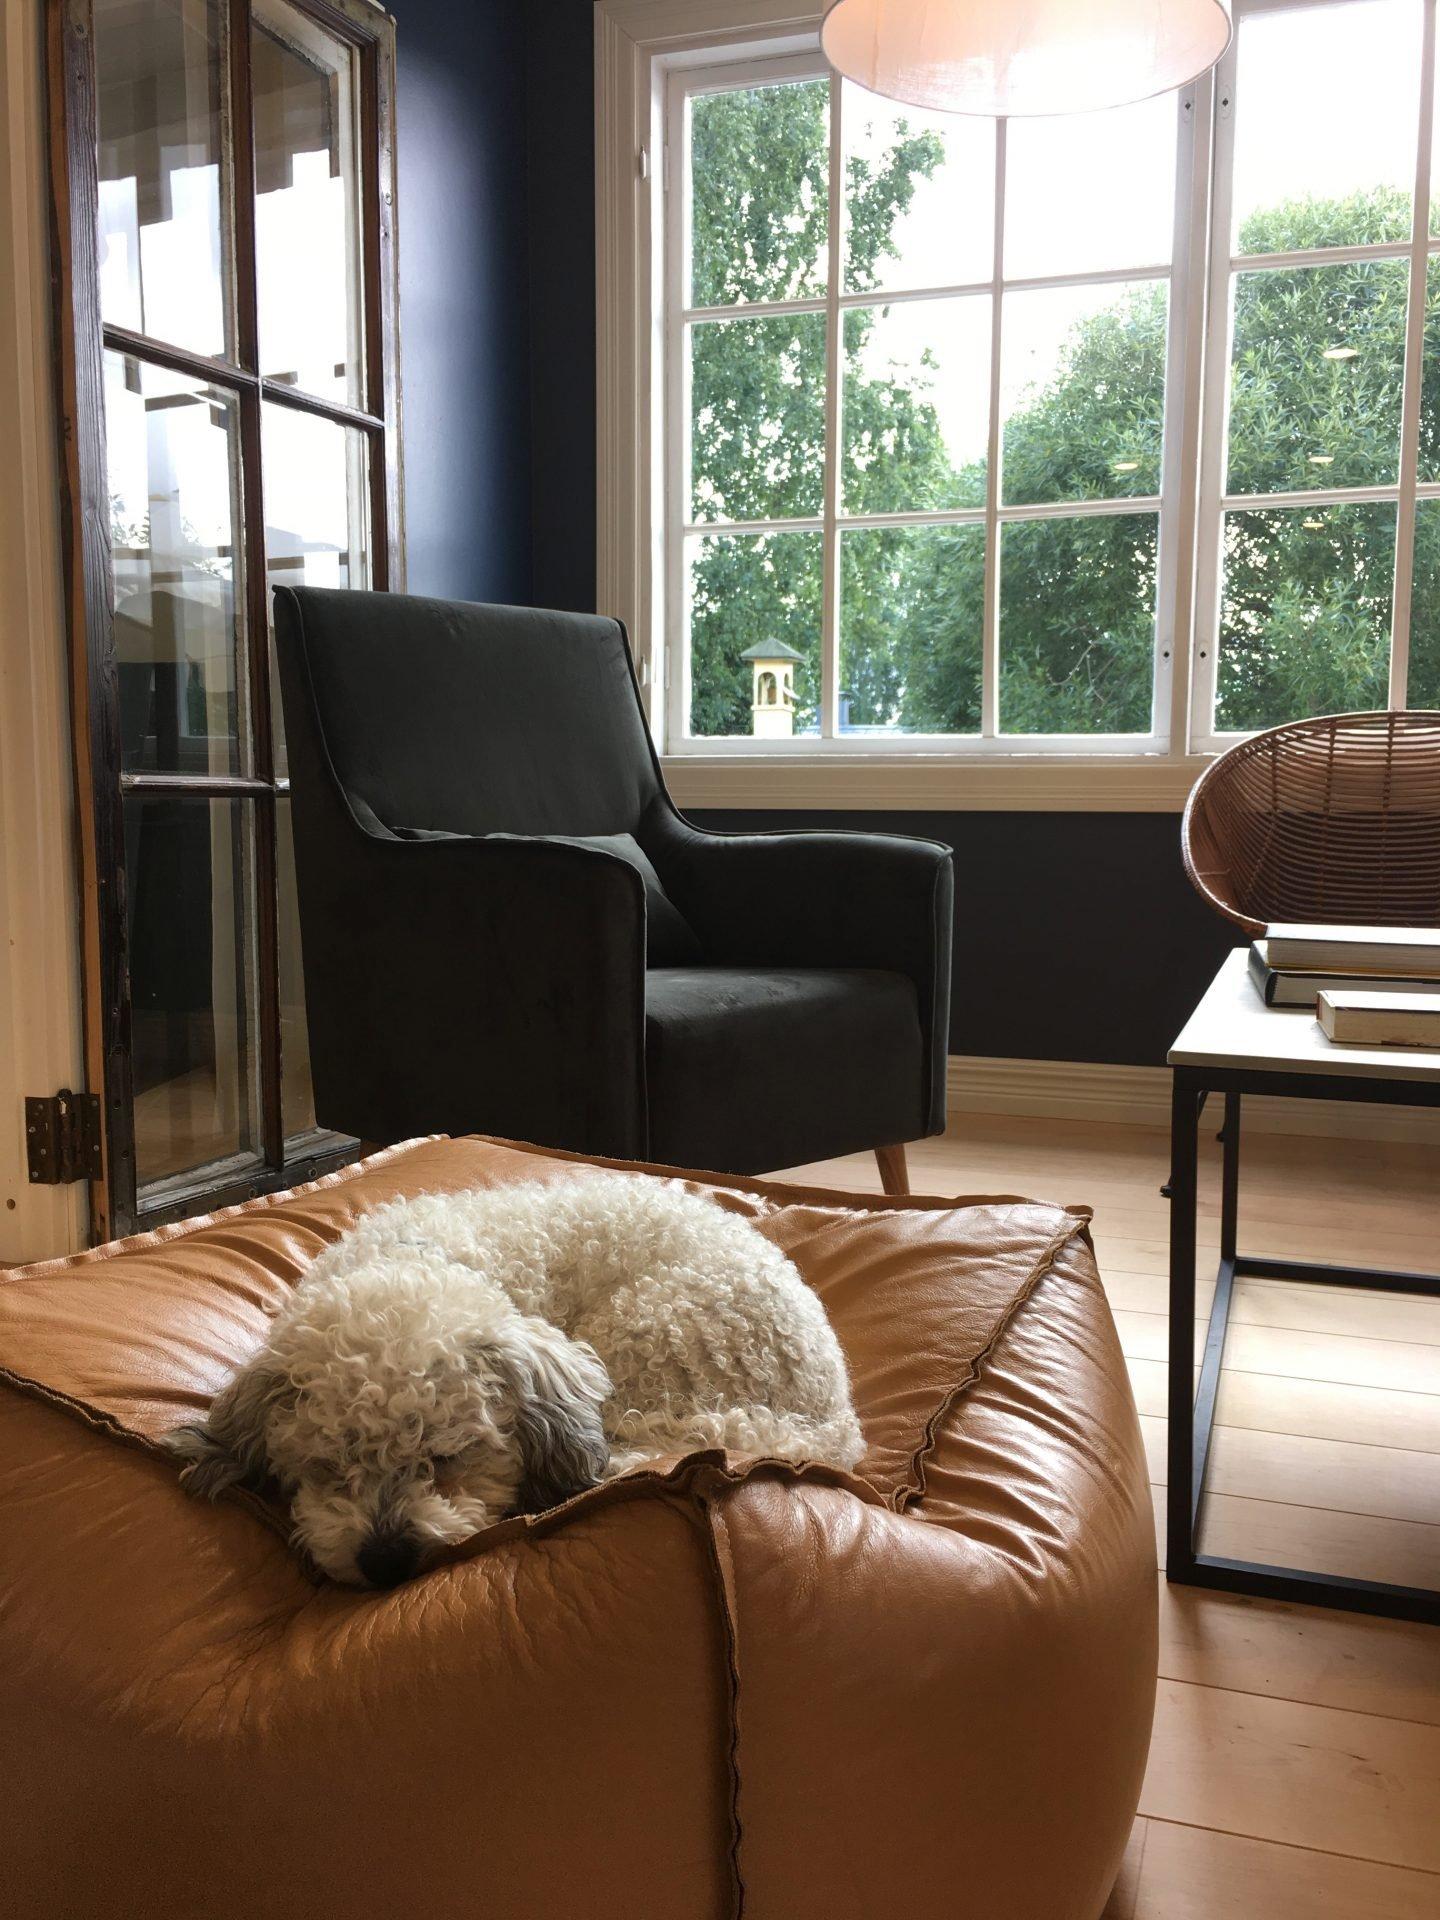 Koira Hotel & Butik Lillan